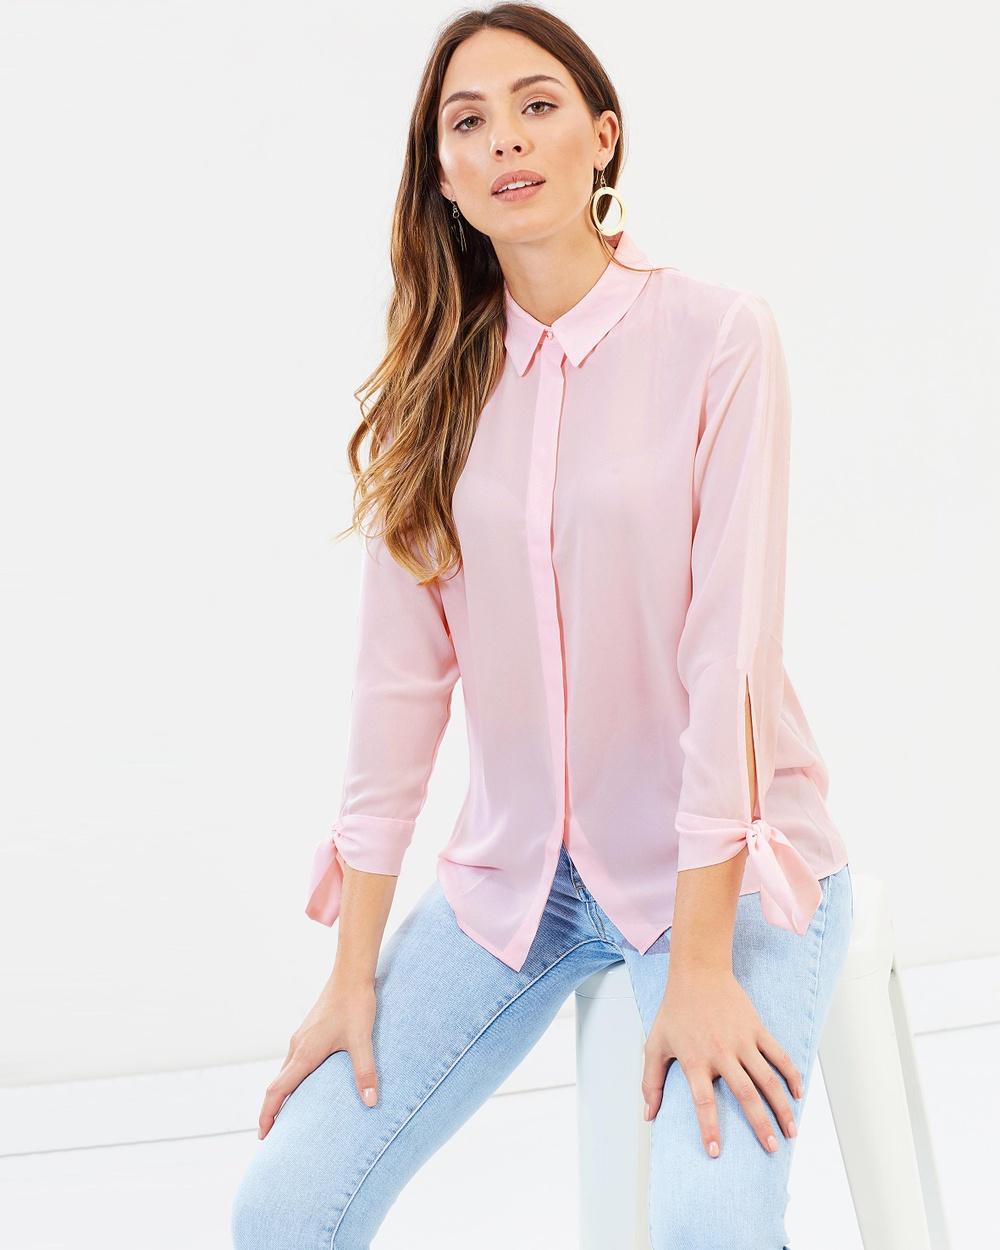 M.N.G Basicpre Shirt Tops Pink Basicpre Shirt